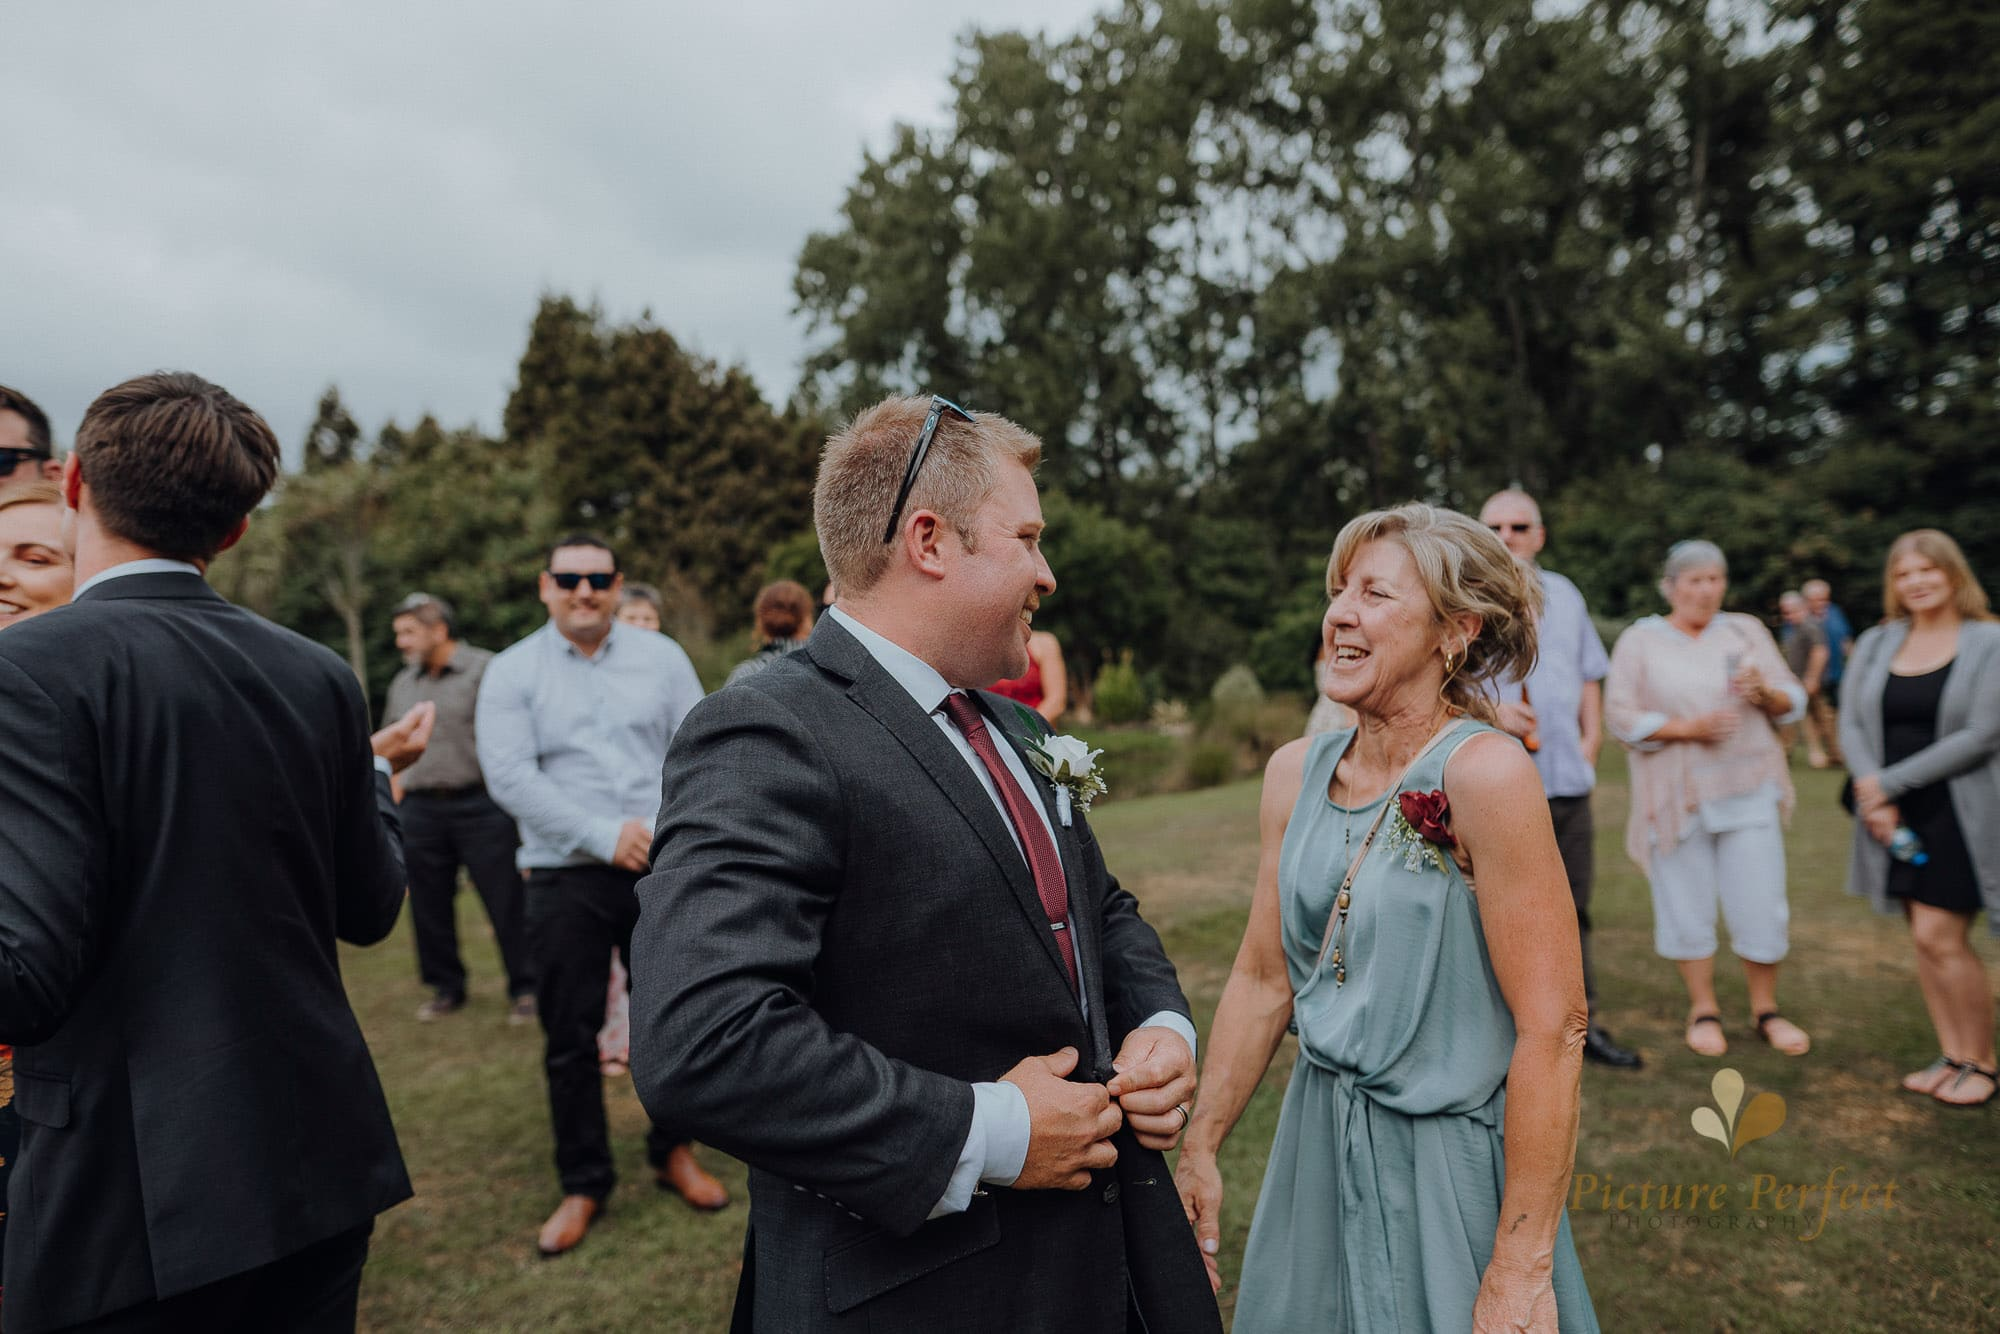 Roseburb Park wedding of Casey 1612